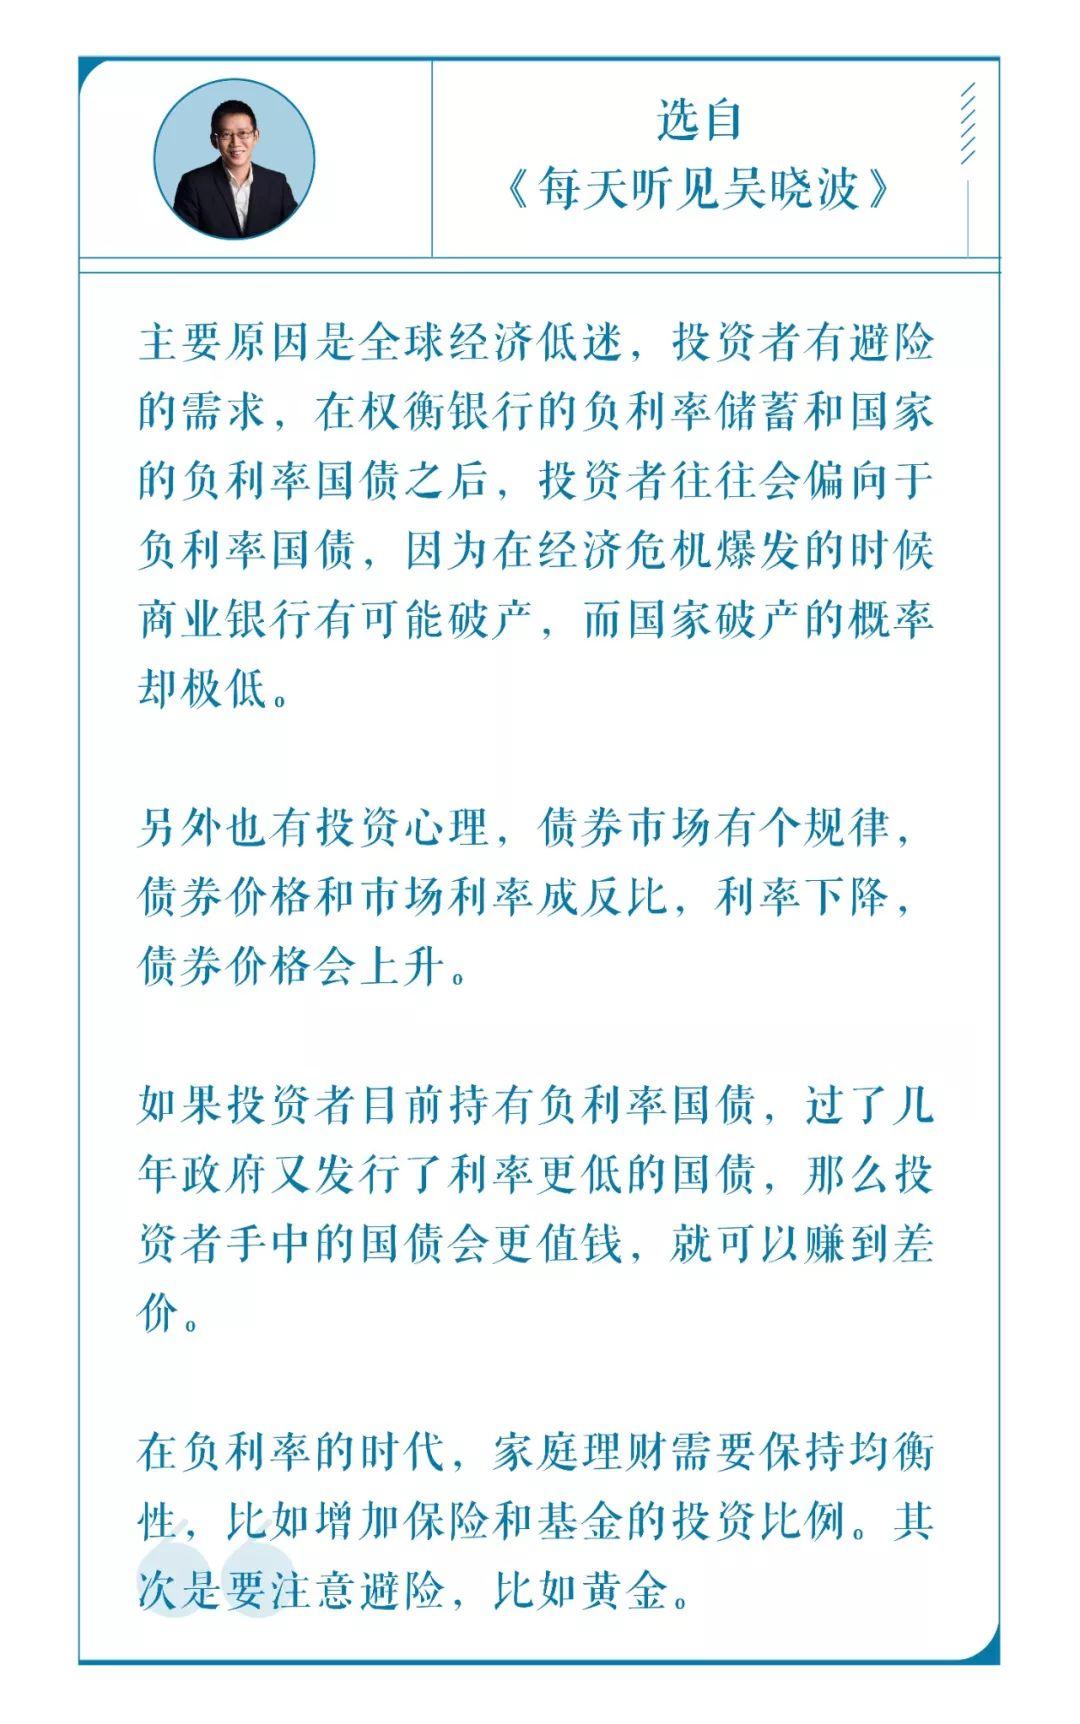 www.vtm0099.com·经济日报:恶意炒作外资撤离 实属居心叵测别有用意